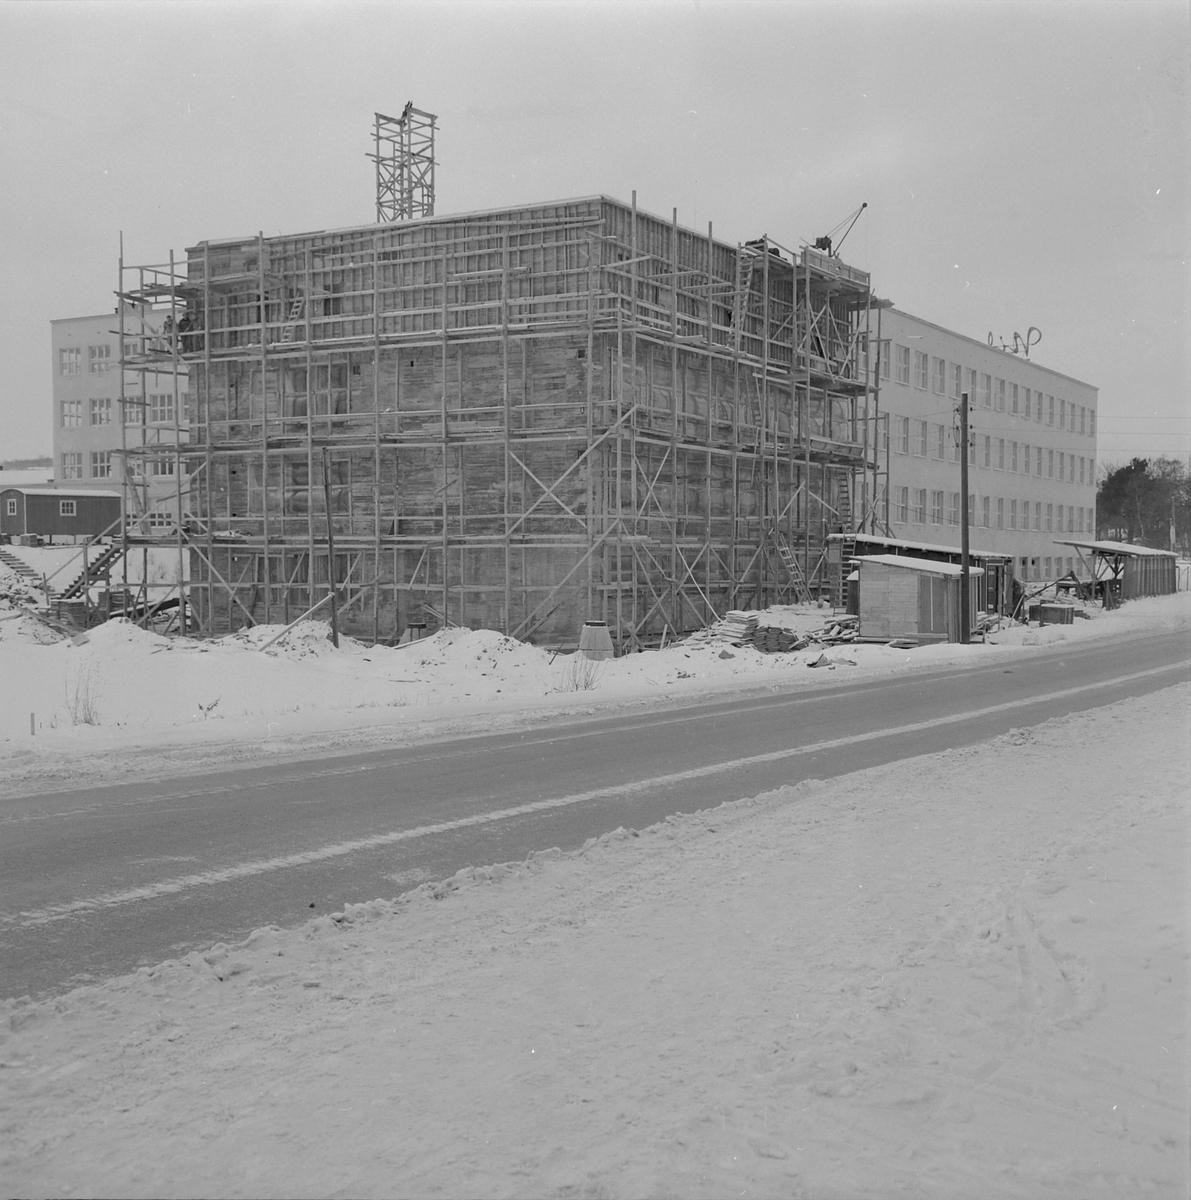 Byggearbeid ved Nidar Chokoladefabriks nye bygg i Bromstadvegen